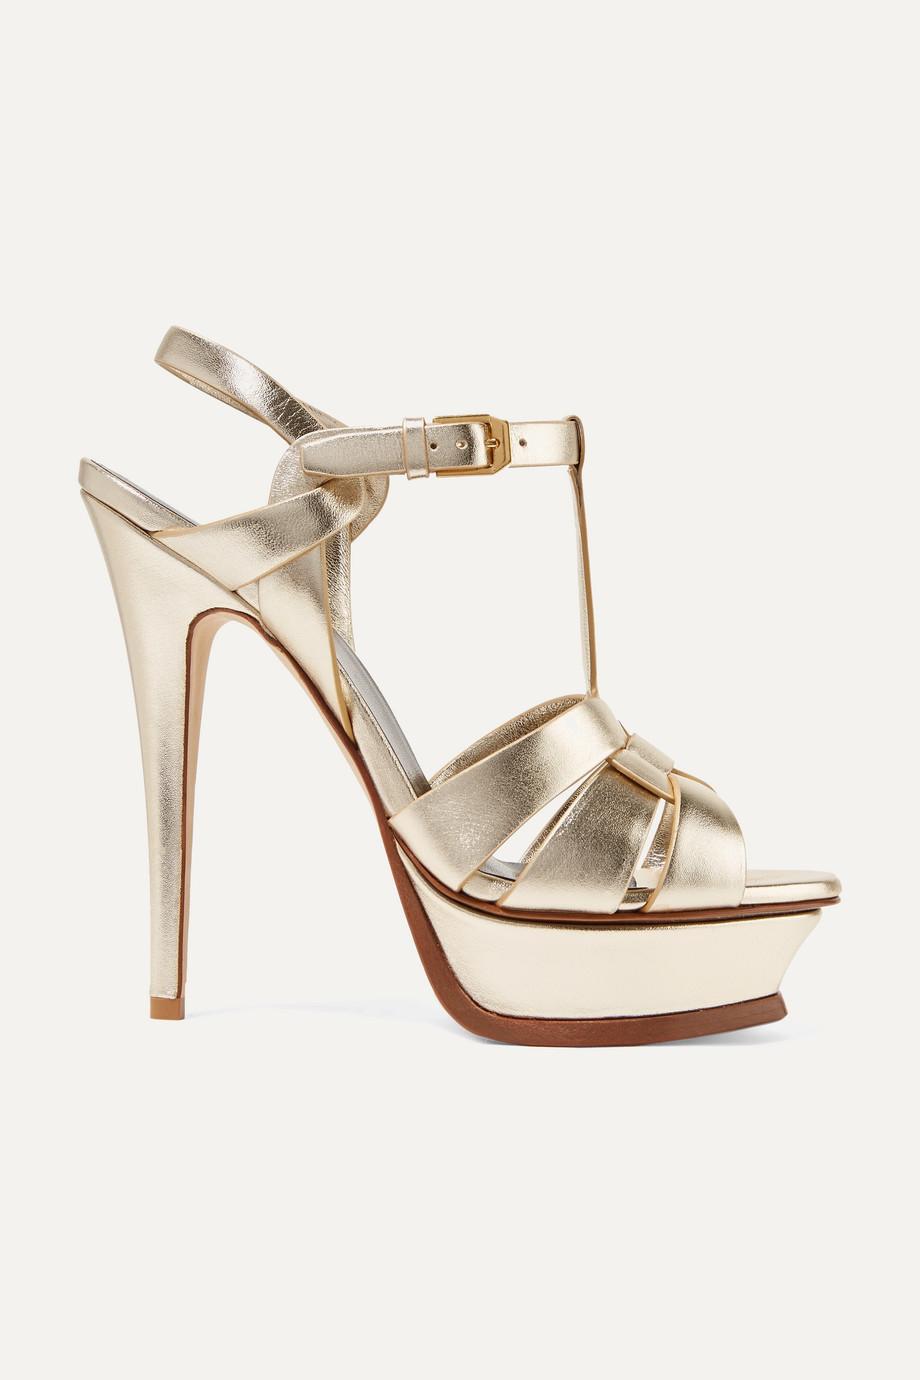 SAINT LAURENT Tribute woven metallic leather platform sandals